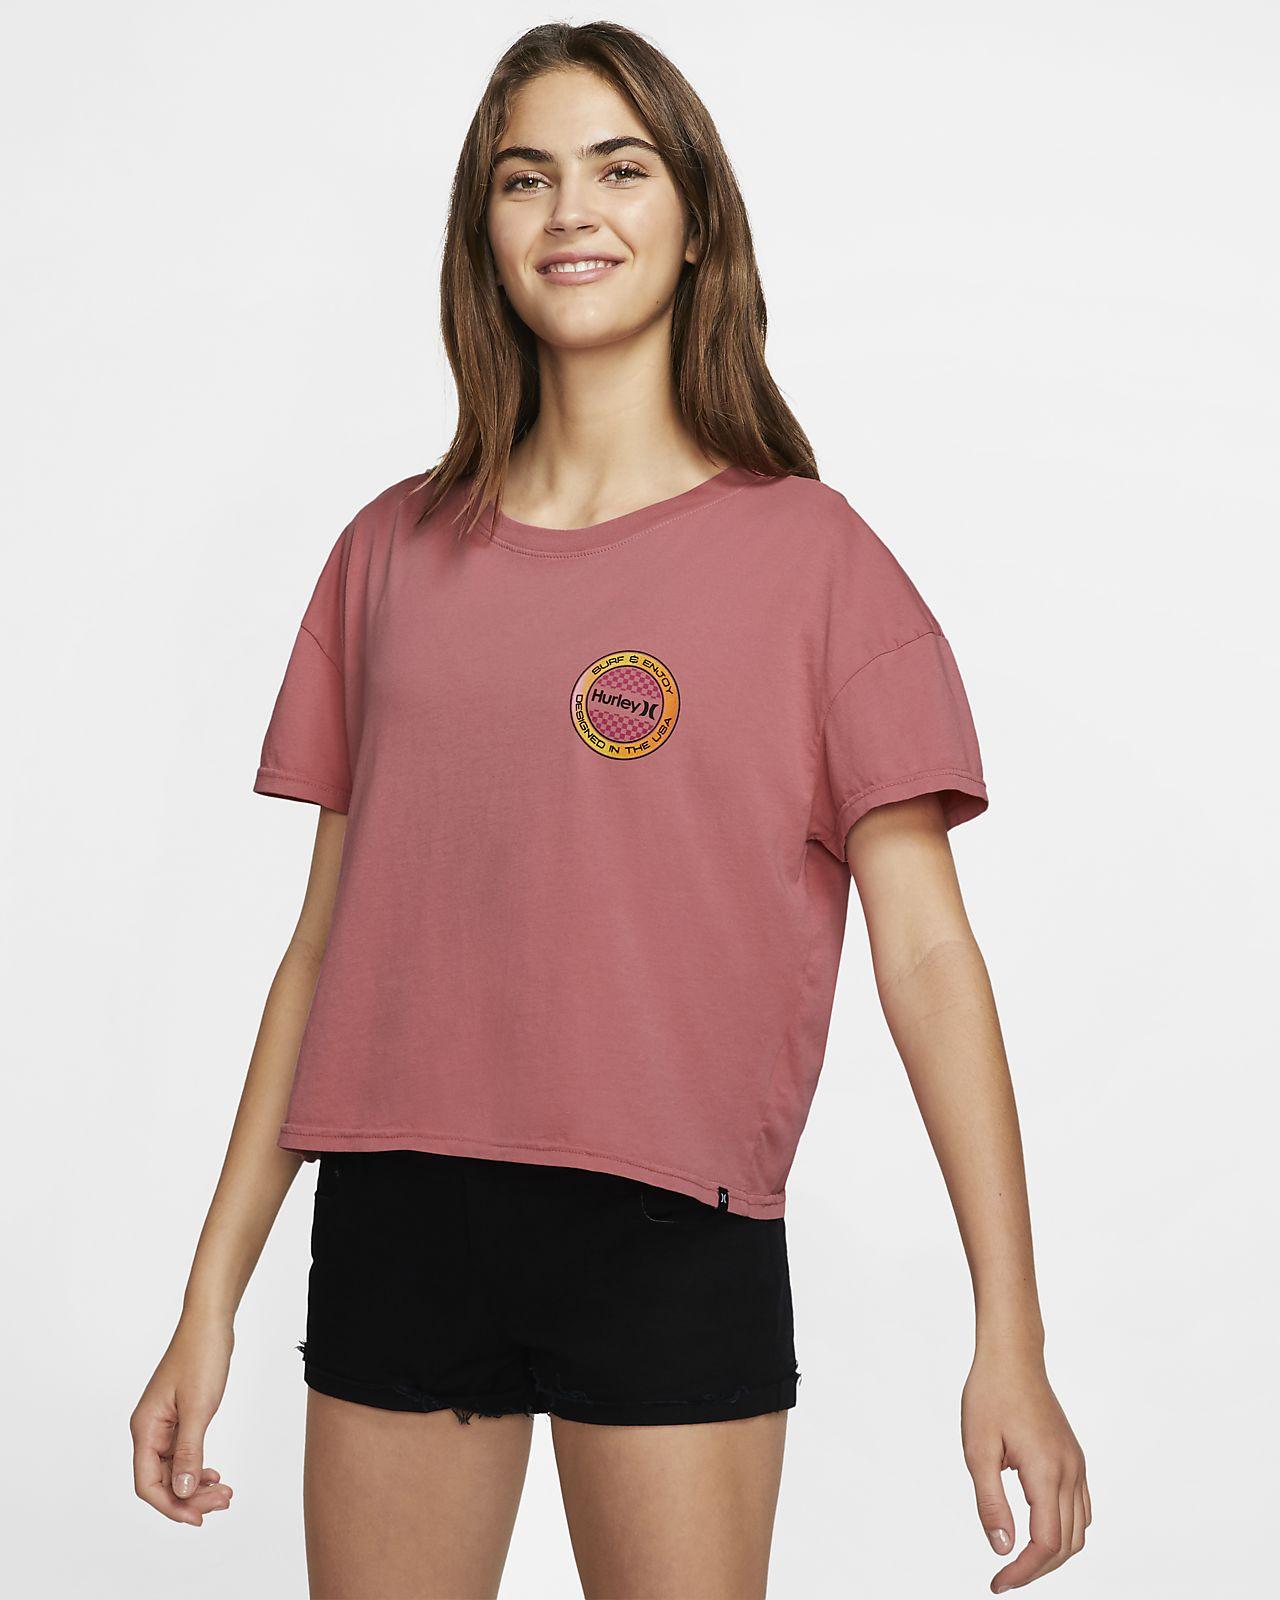 Hurley Circle Check Flouncy Women's T-Shirt